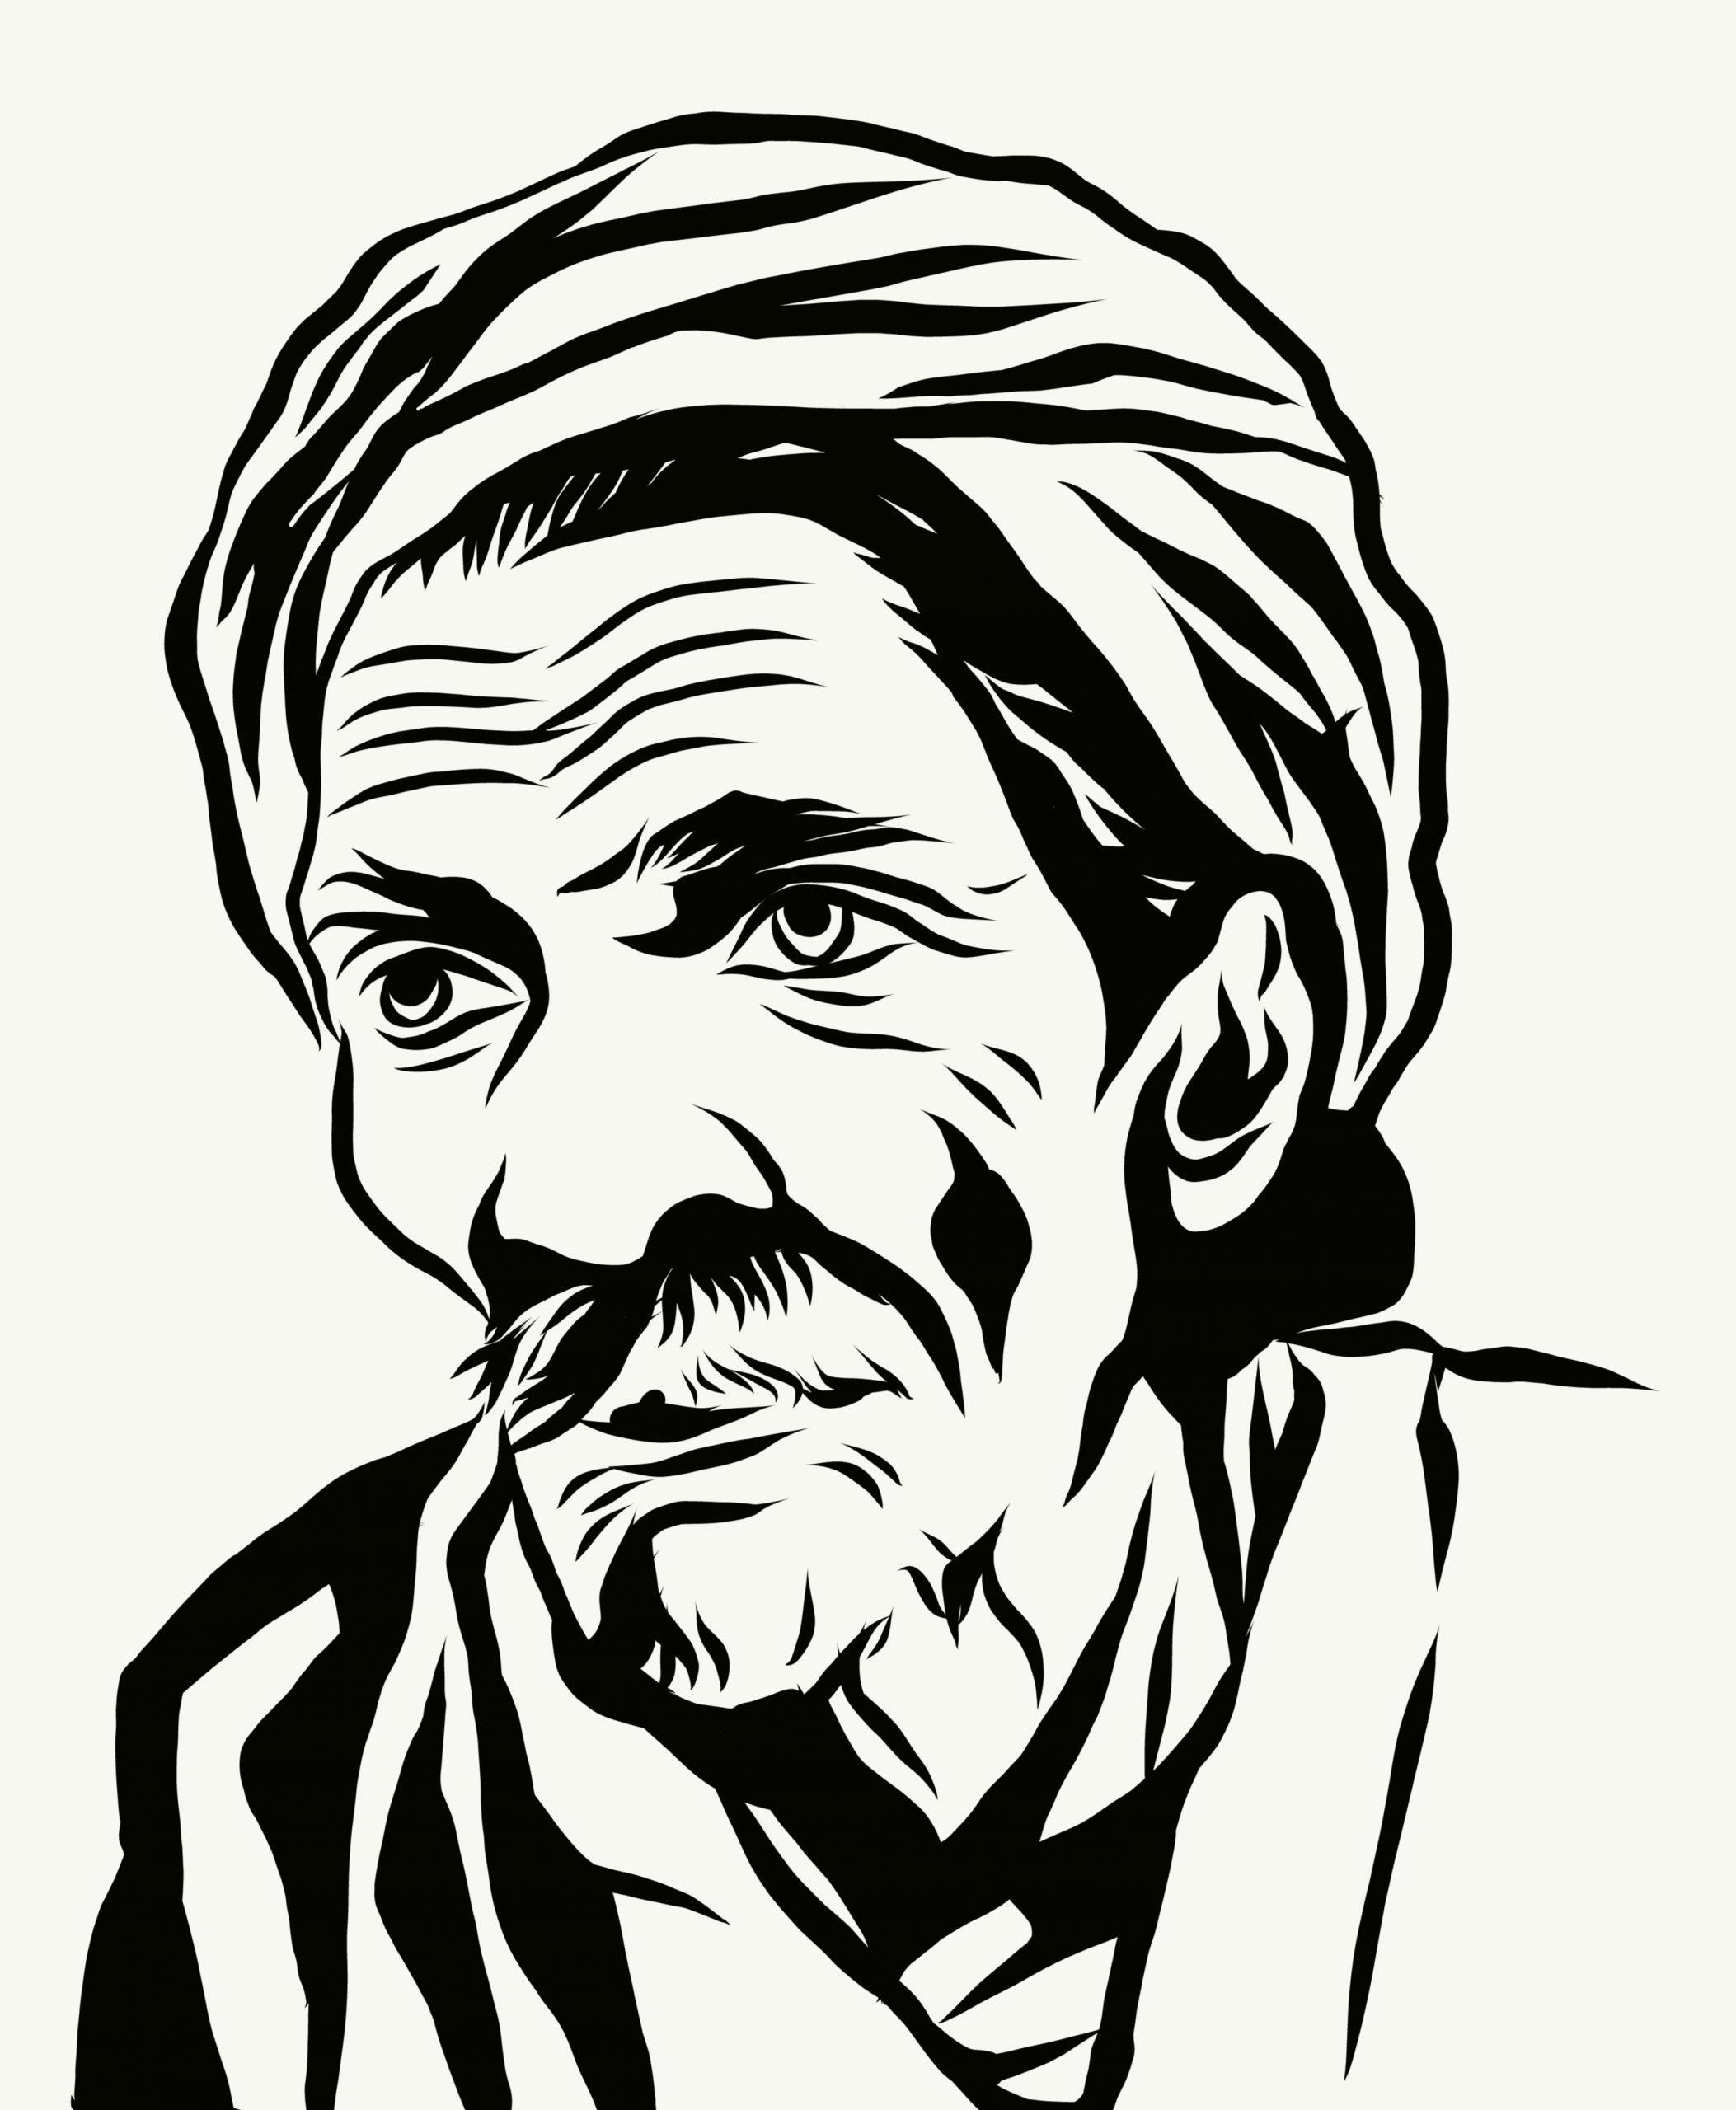 Portrait illustration of an old man